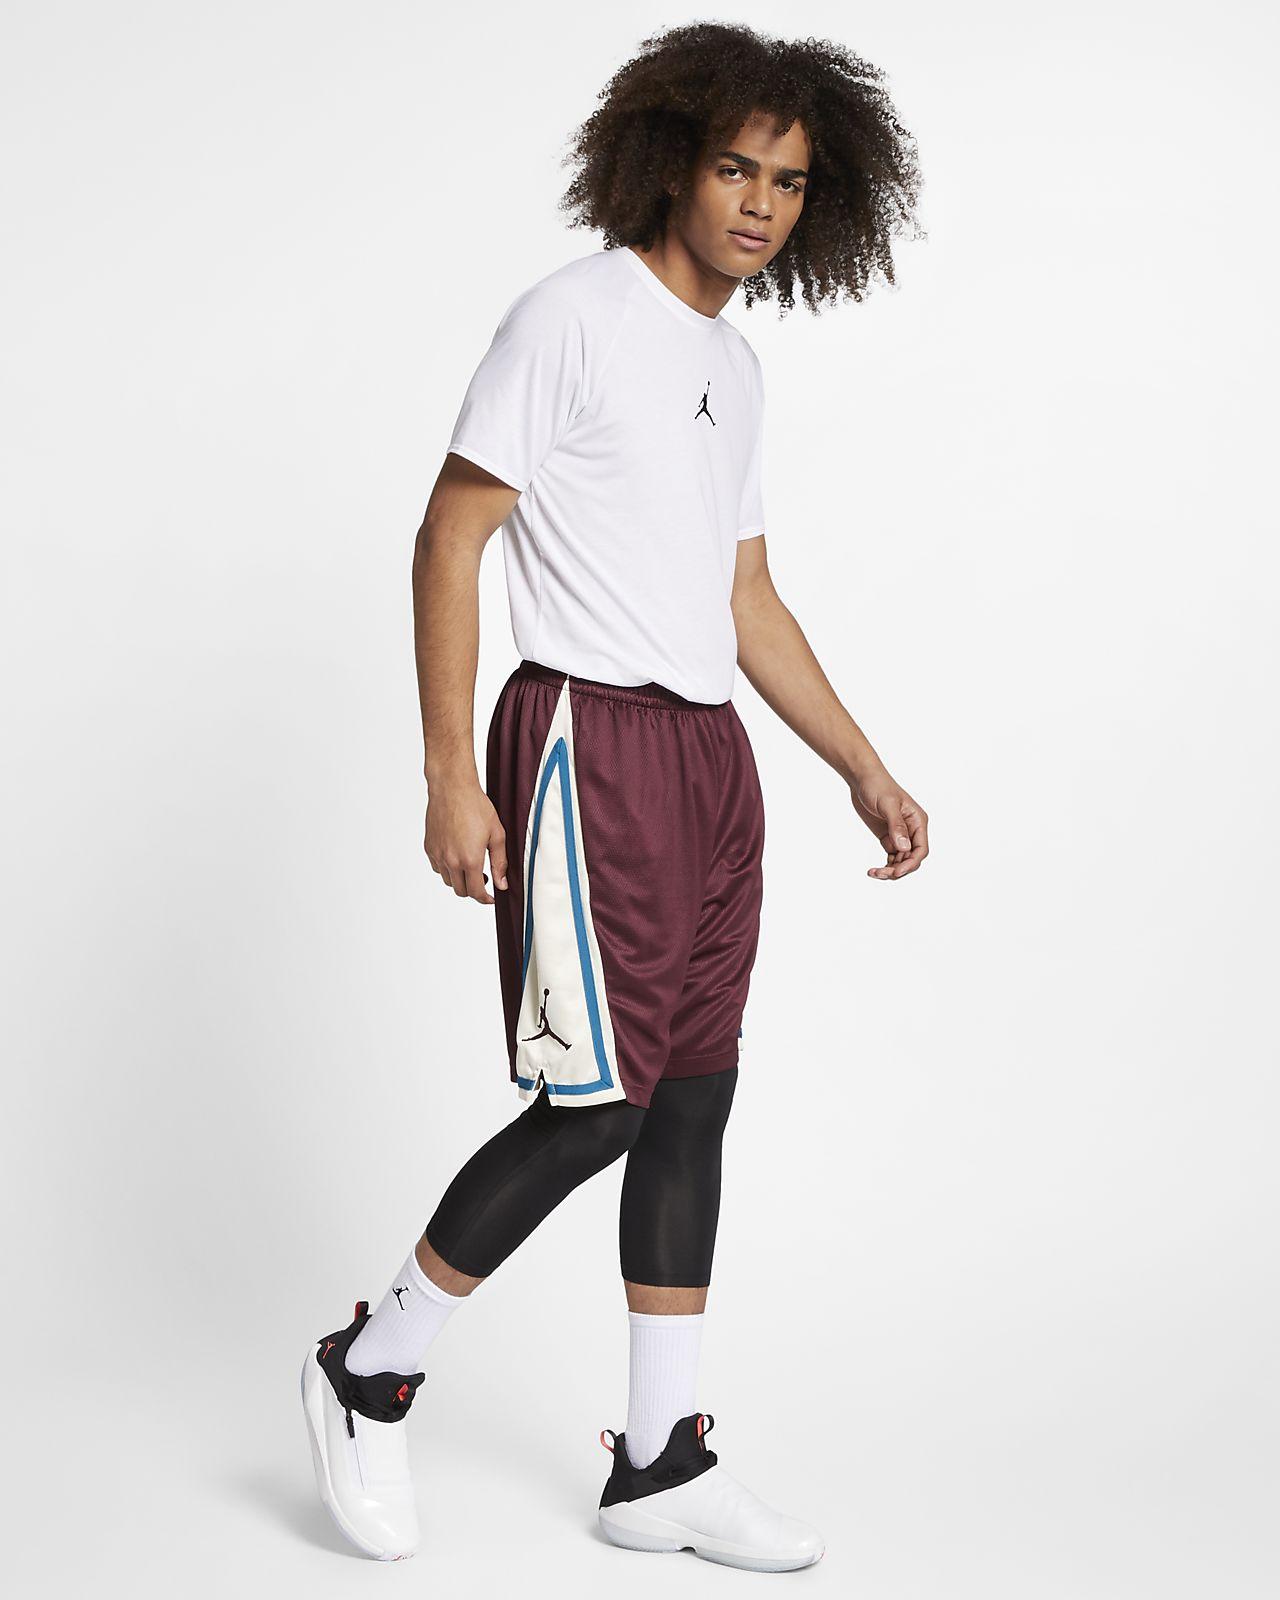 bcfb0597d60 Low Resolution Jordan Franchise Men's Basketball Shorts Jordan Franchise  Men's Basketball Shorts